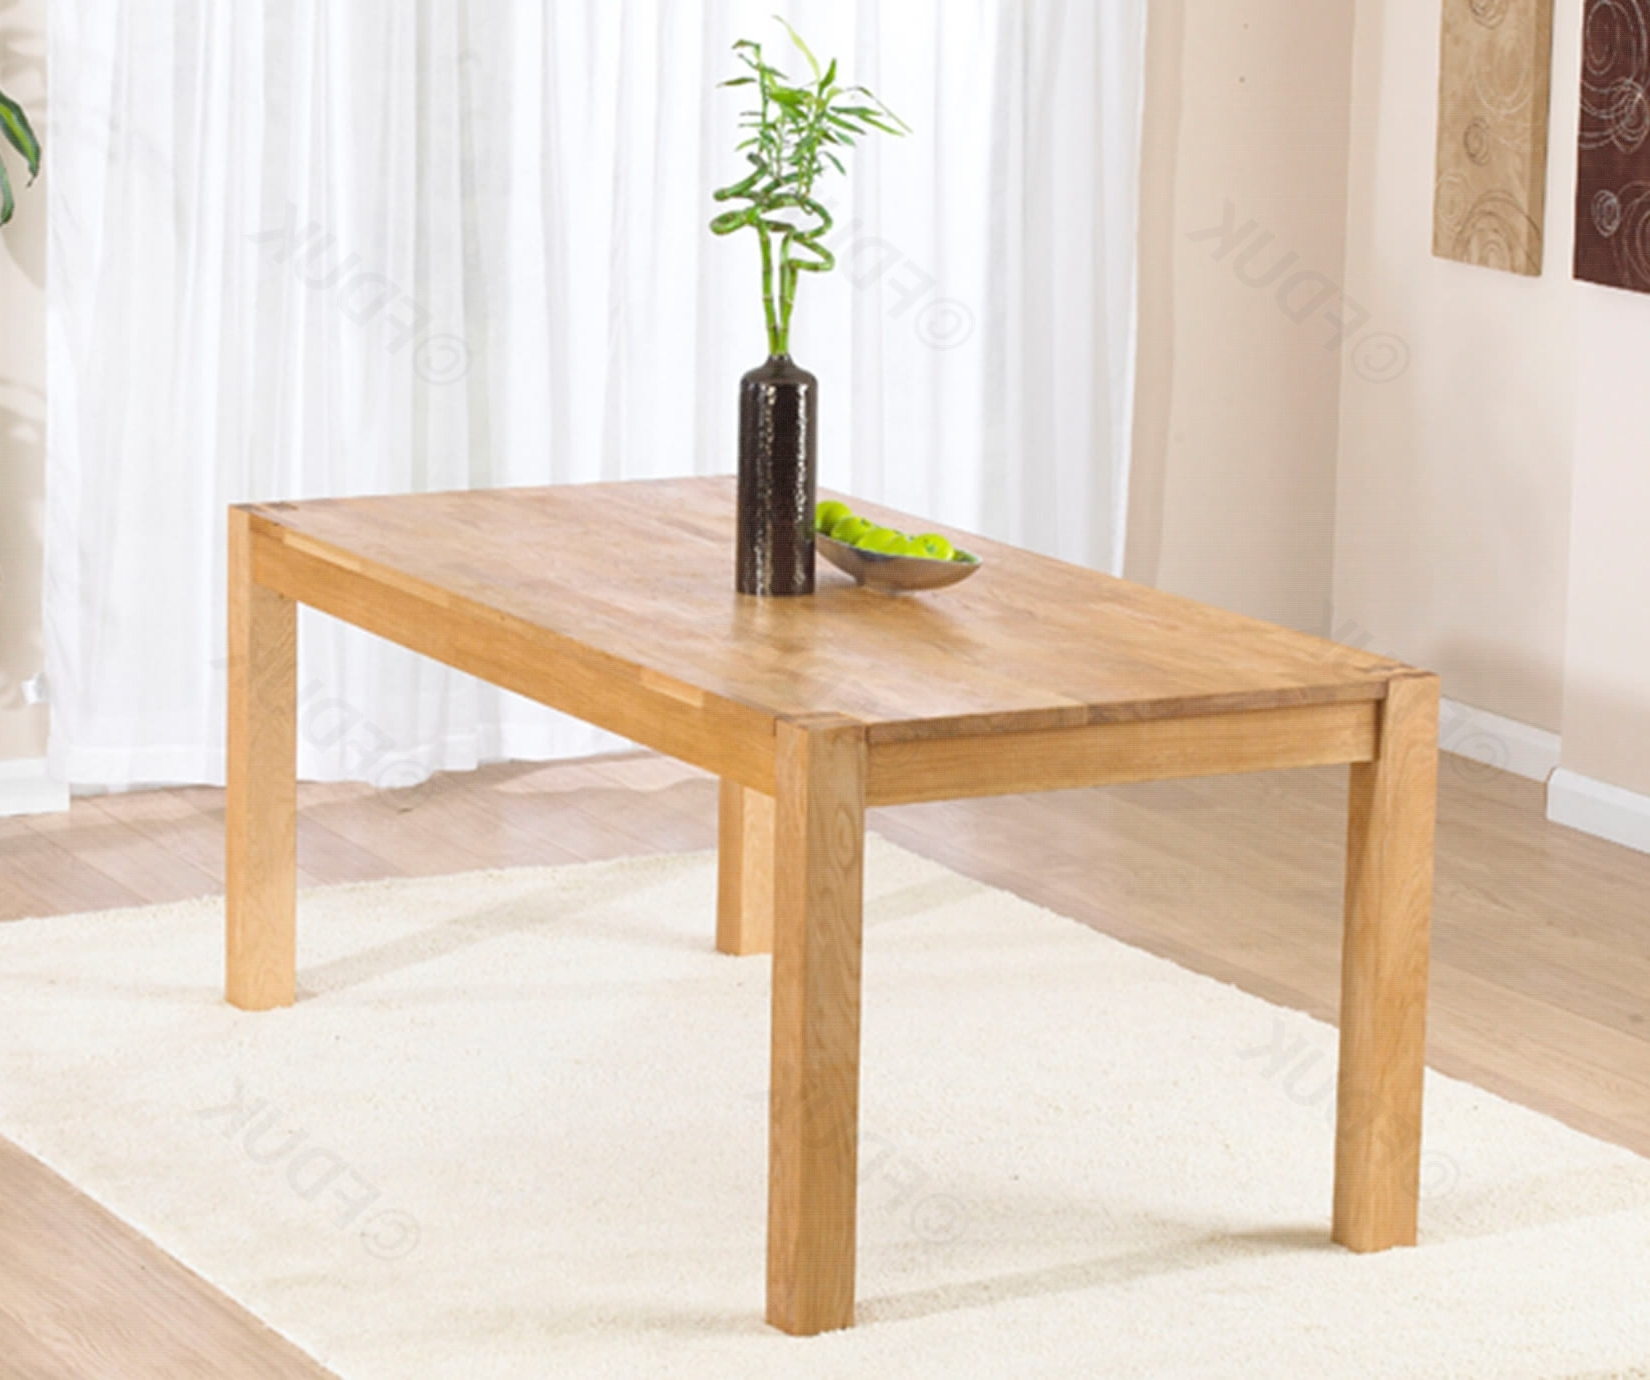 Furnituredirectuk (View 6 of 25)